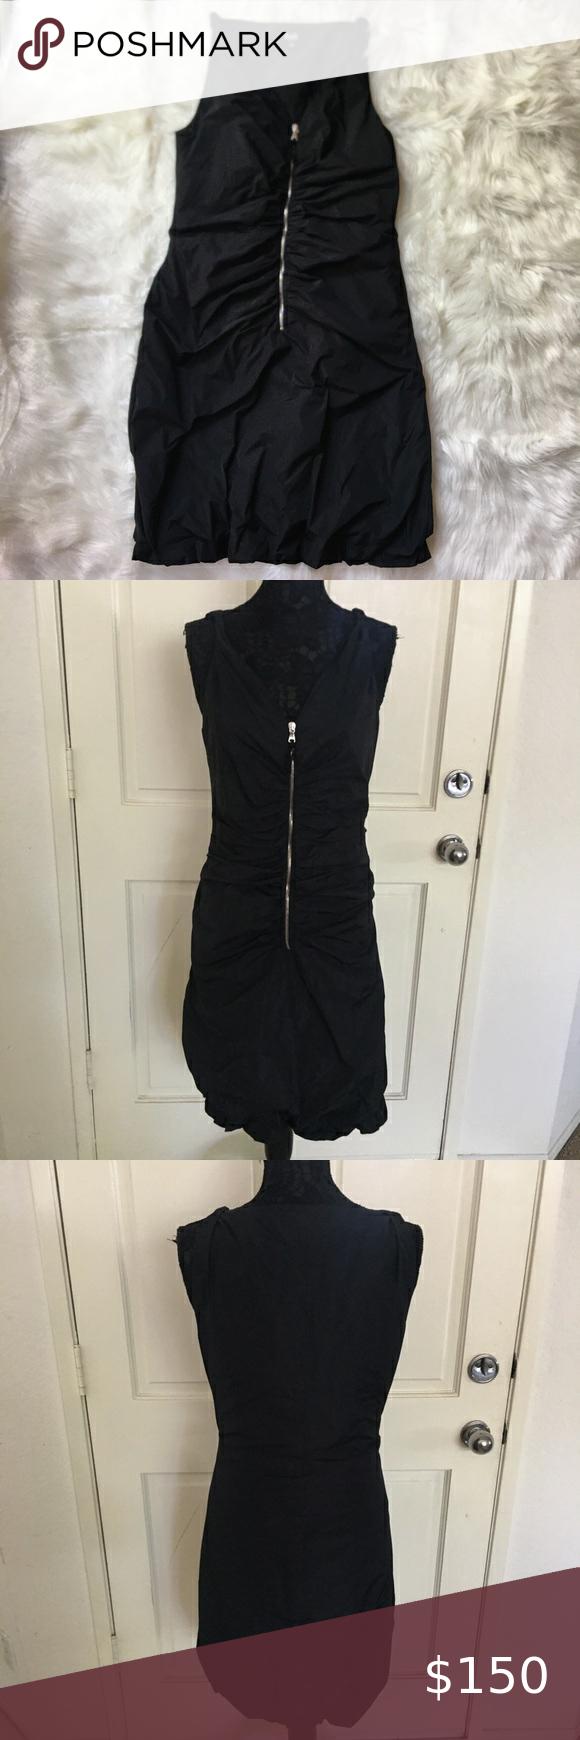 Dolce Gabbana Women S Black Dress Size 12 Dolce Gabbana Black Knee Length Ruched Dre Womens Black Dress Long Sleeve Pencil Dress Strapless Cocktail Dresses [ 1740 x 580 Pixel ]